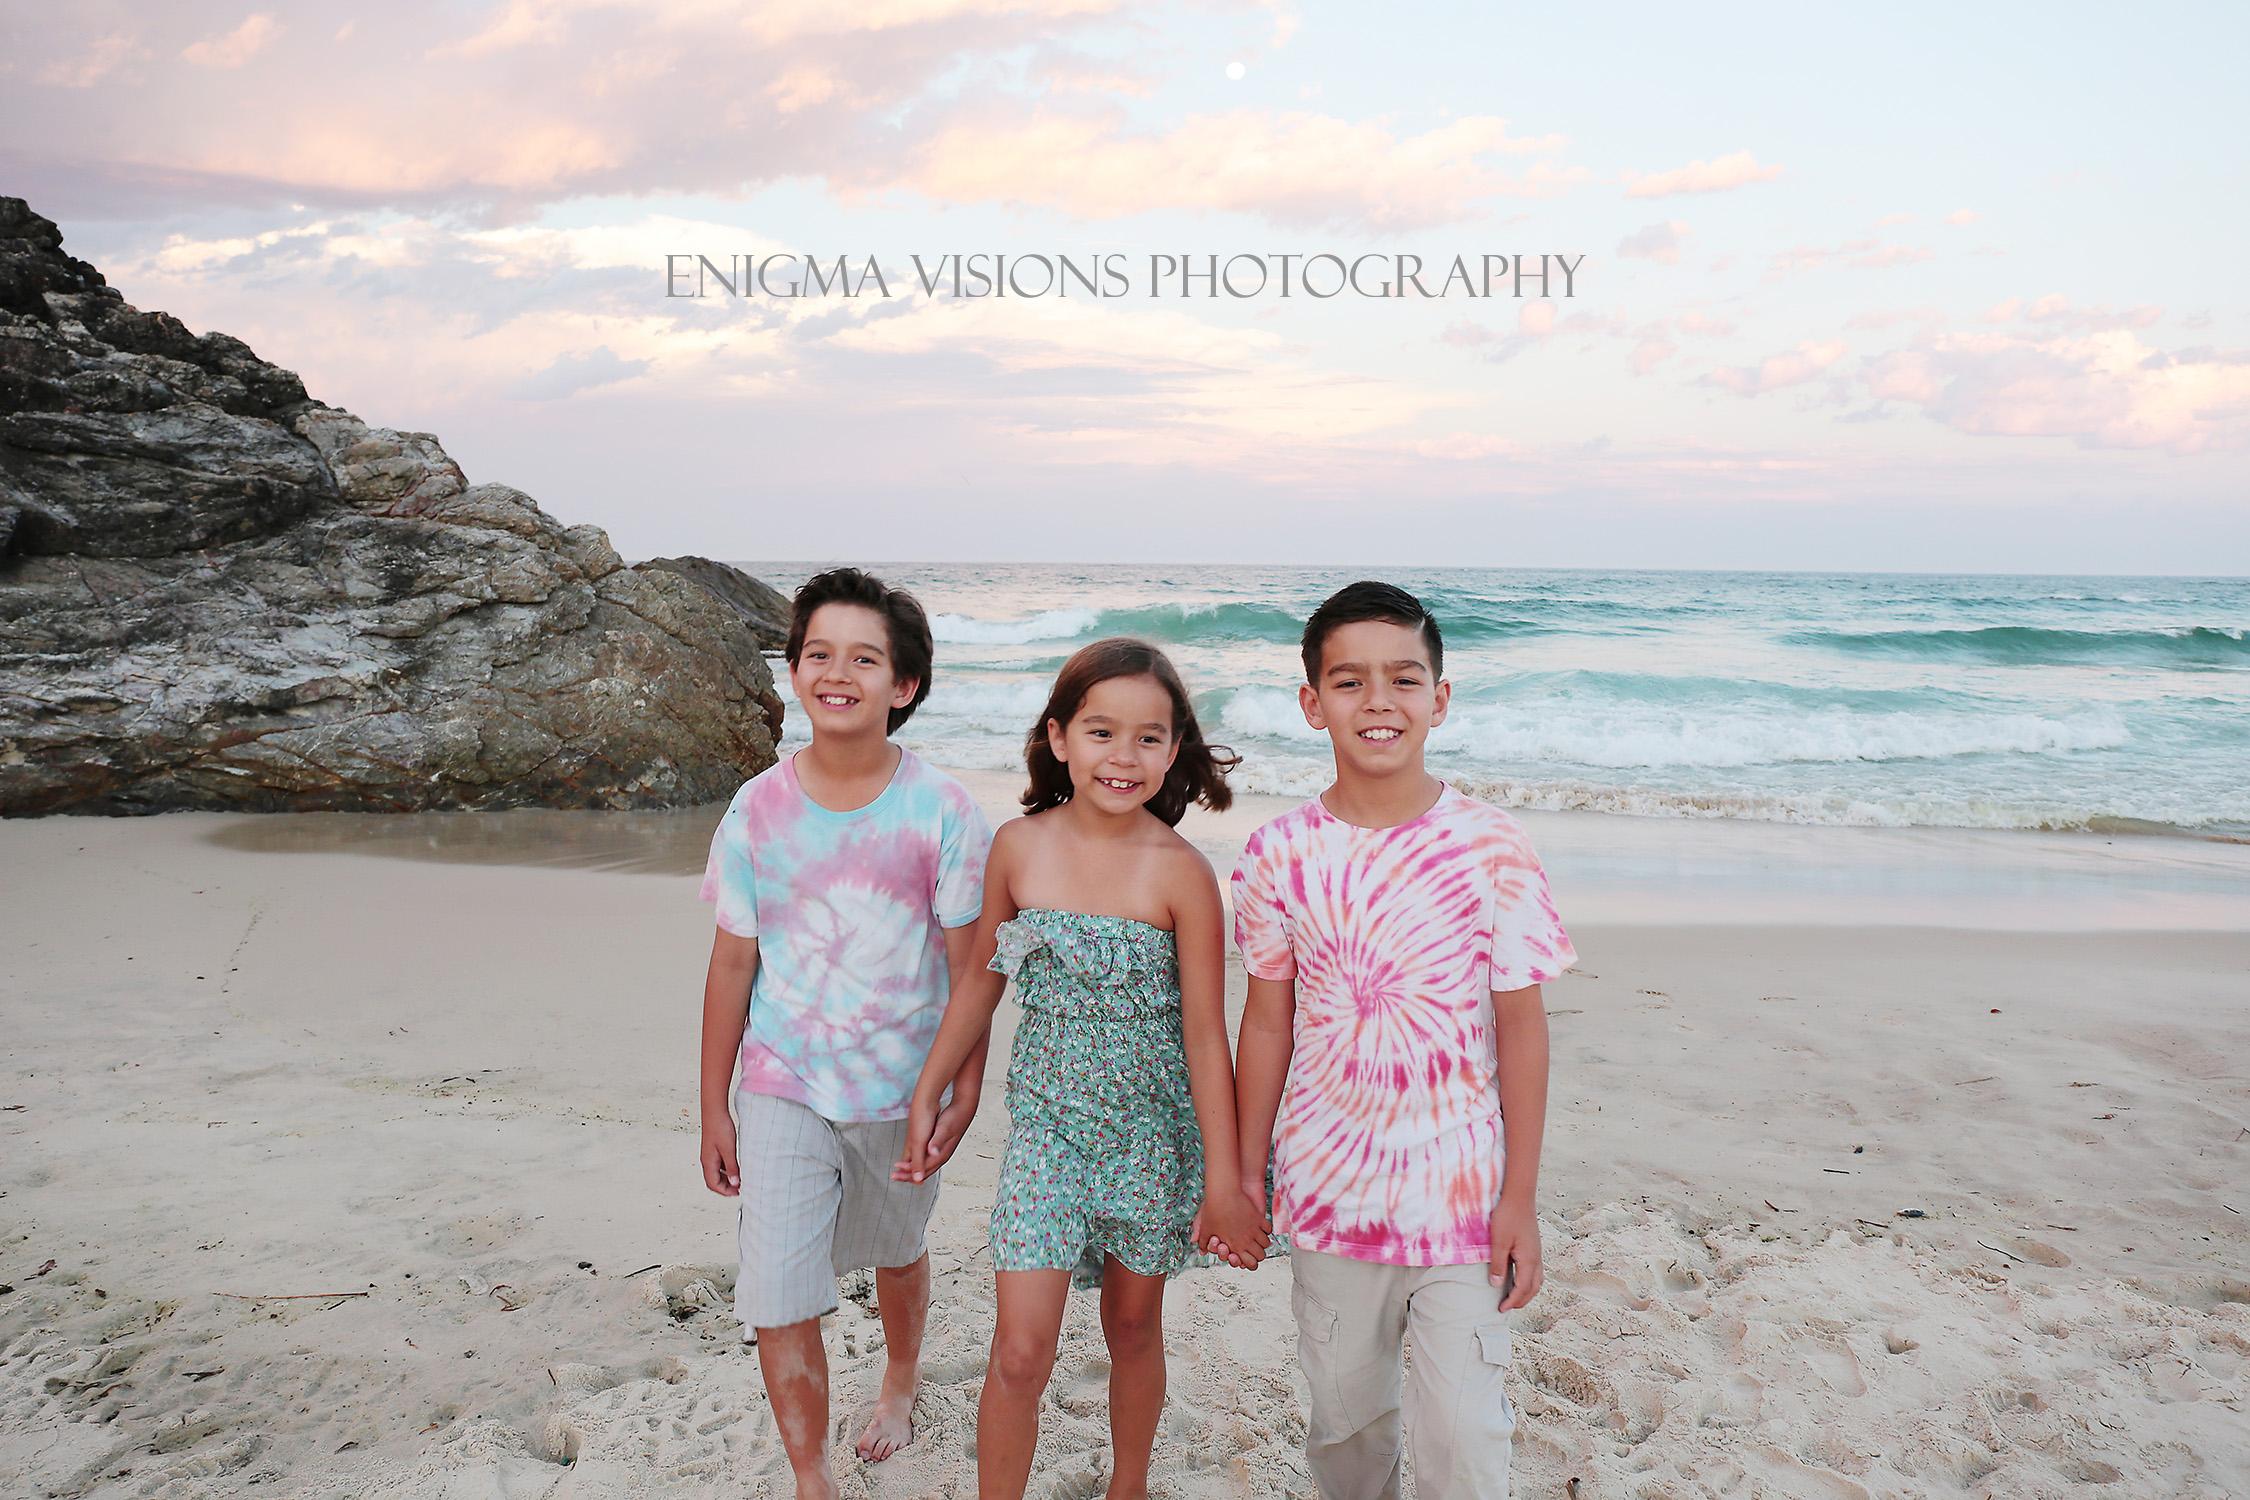 EnigmaVisionsPhotography_FAMILY_Sarah (1).jpg